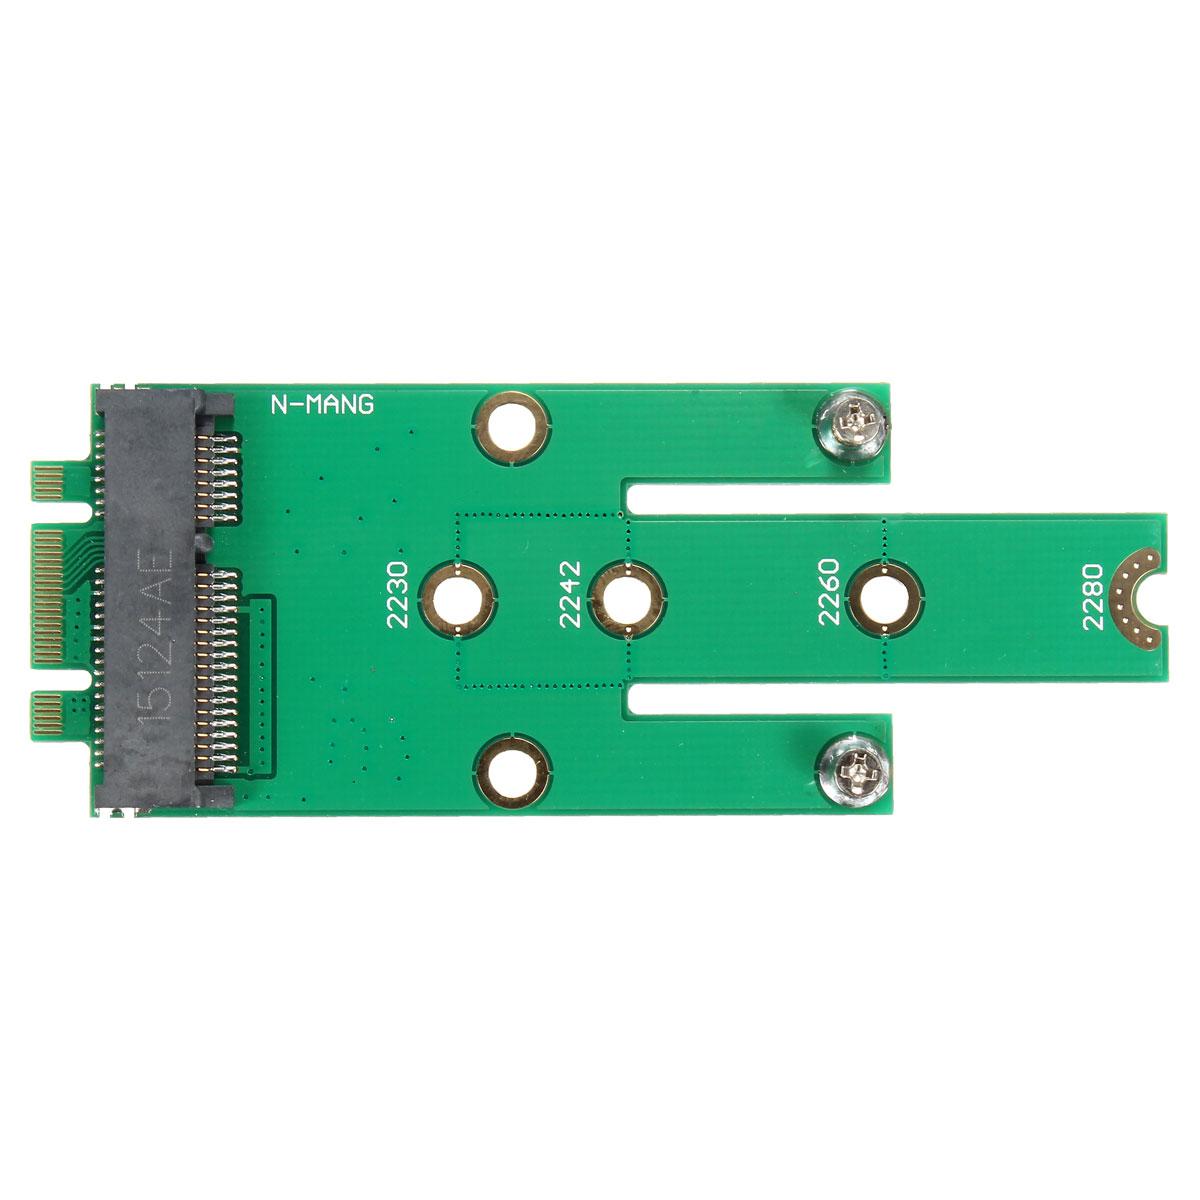 Micro SATA mSATA to M.2 NGFF B-Key SSD Adapter Hard Drive Converter Card